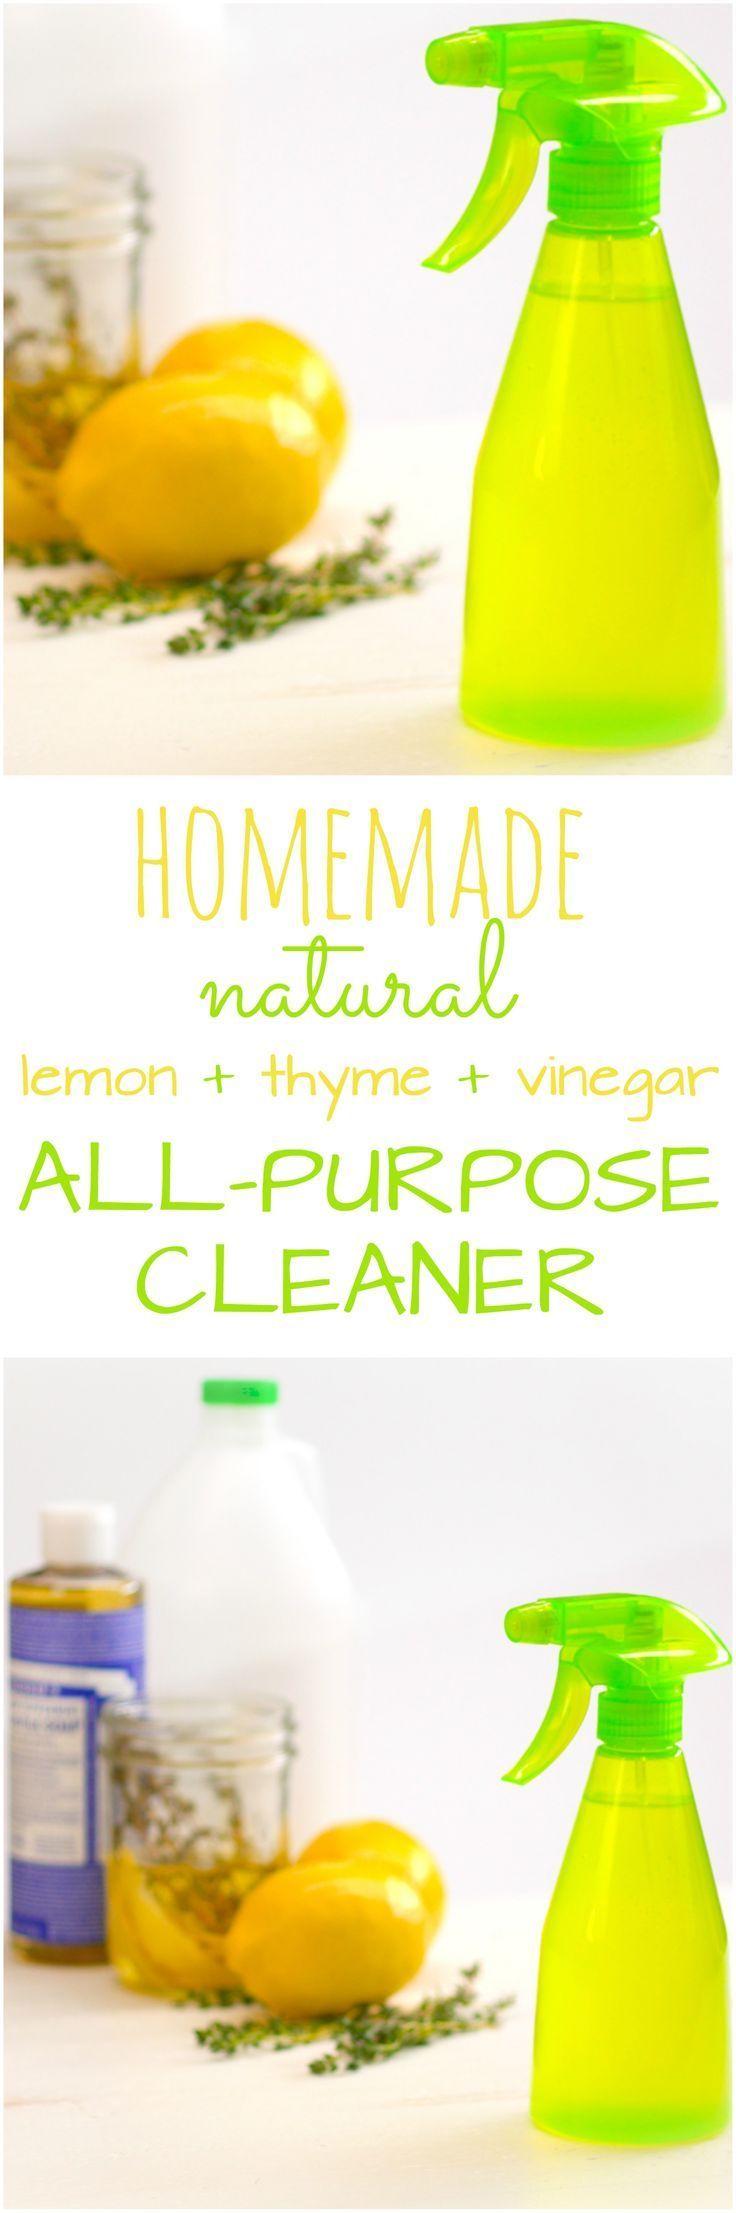 Homemade Natural AllPurpose Cleaner Recipe Organic